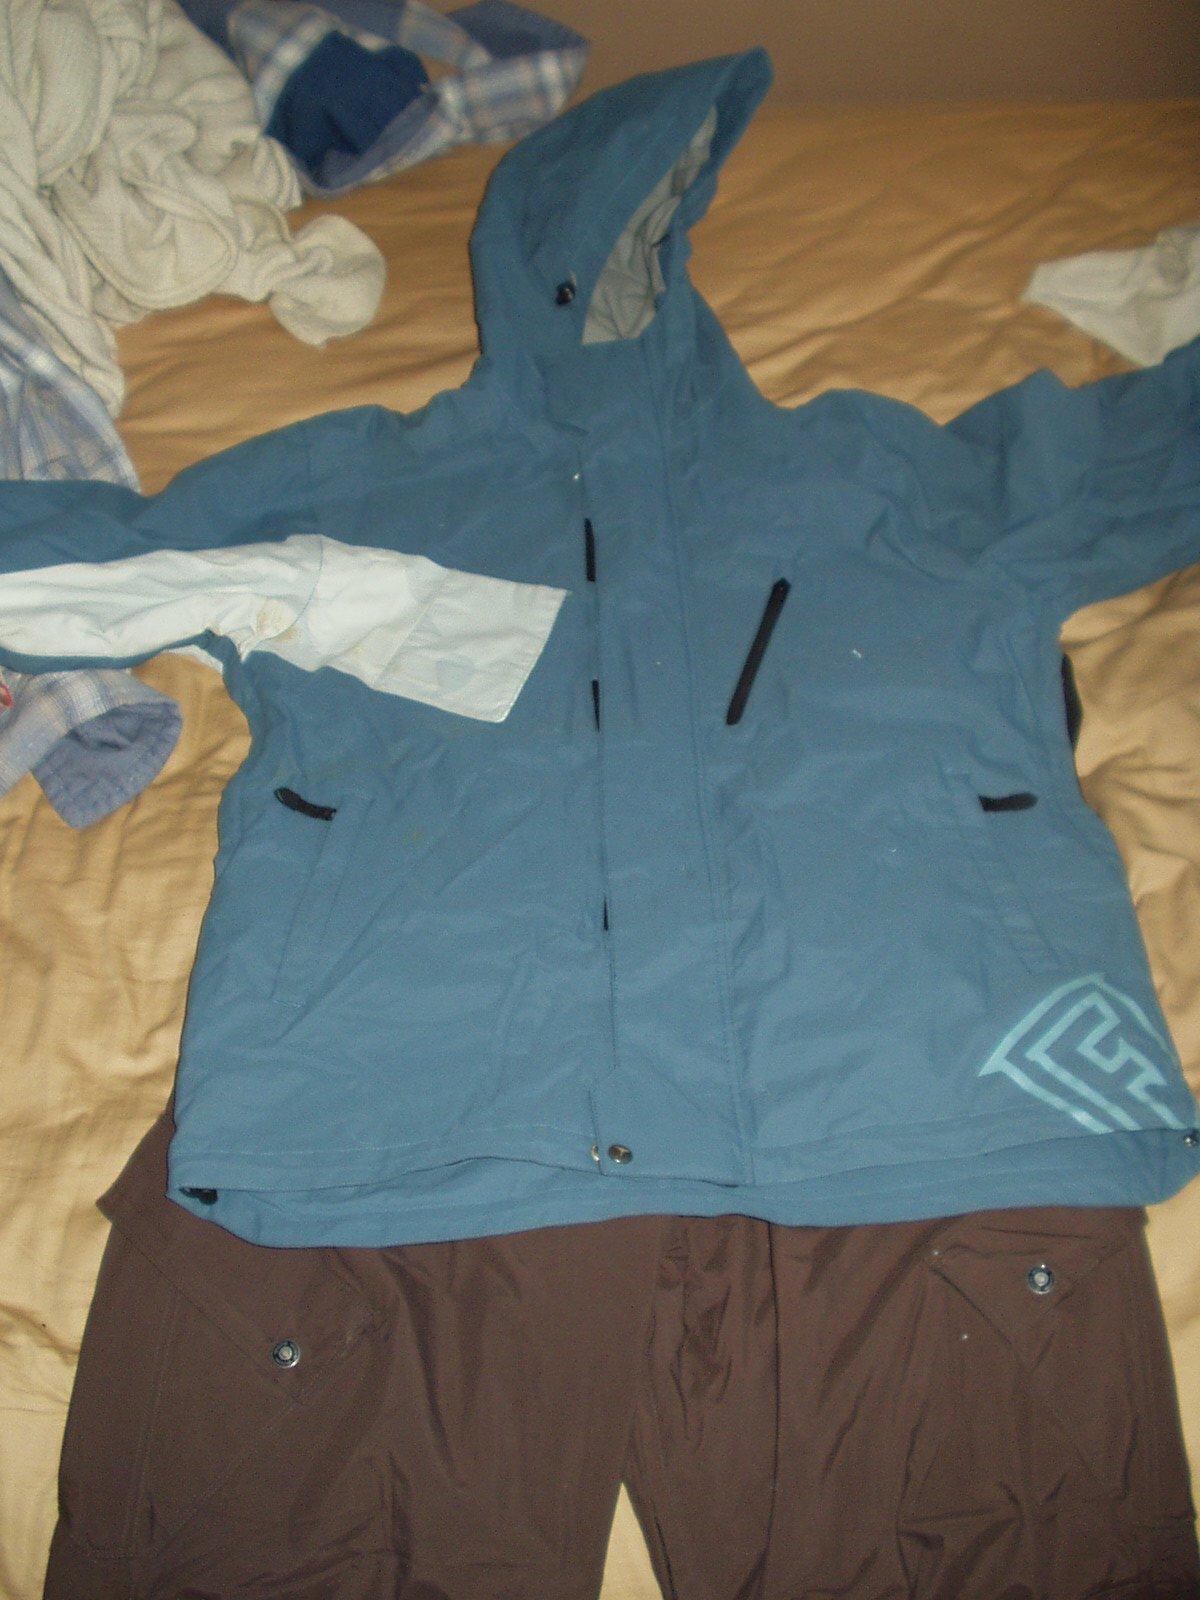 Fate jacket